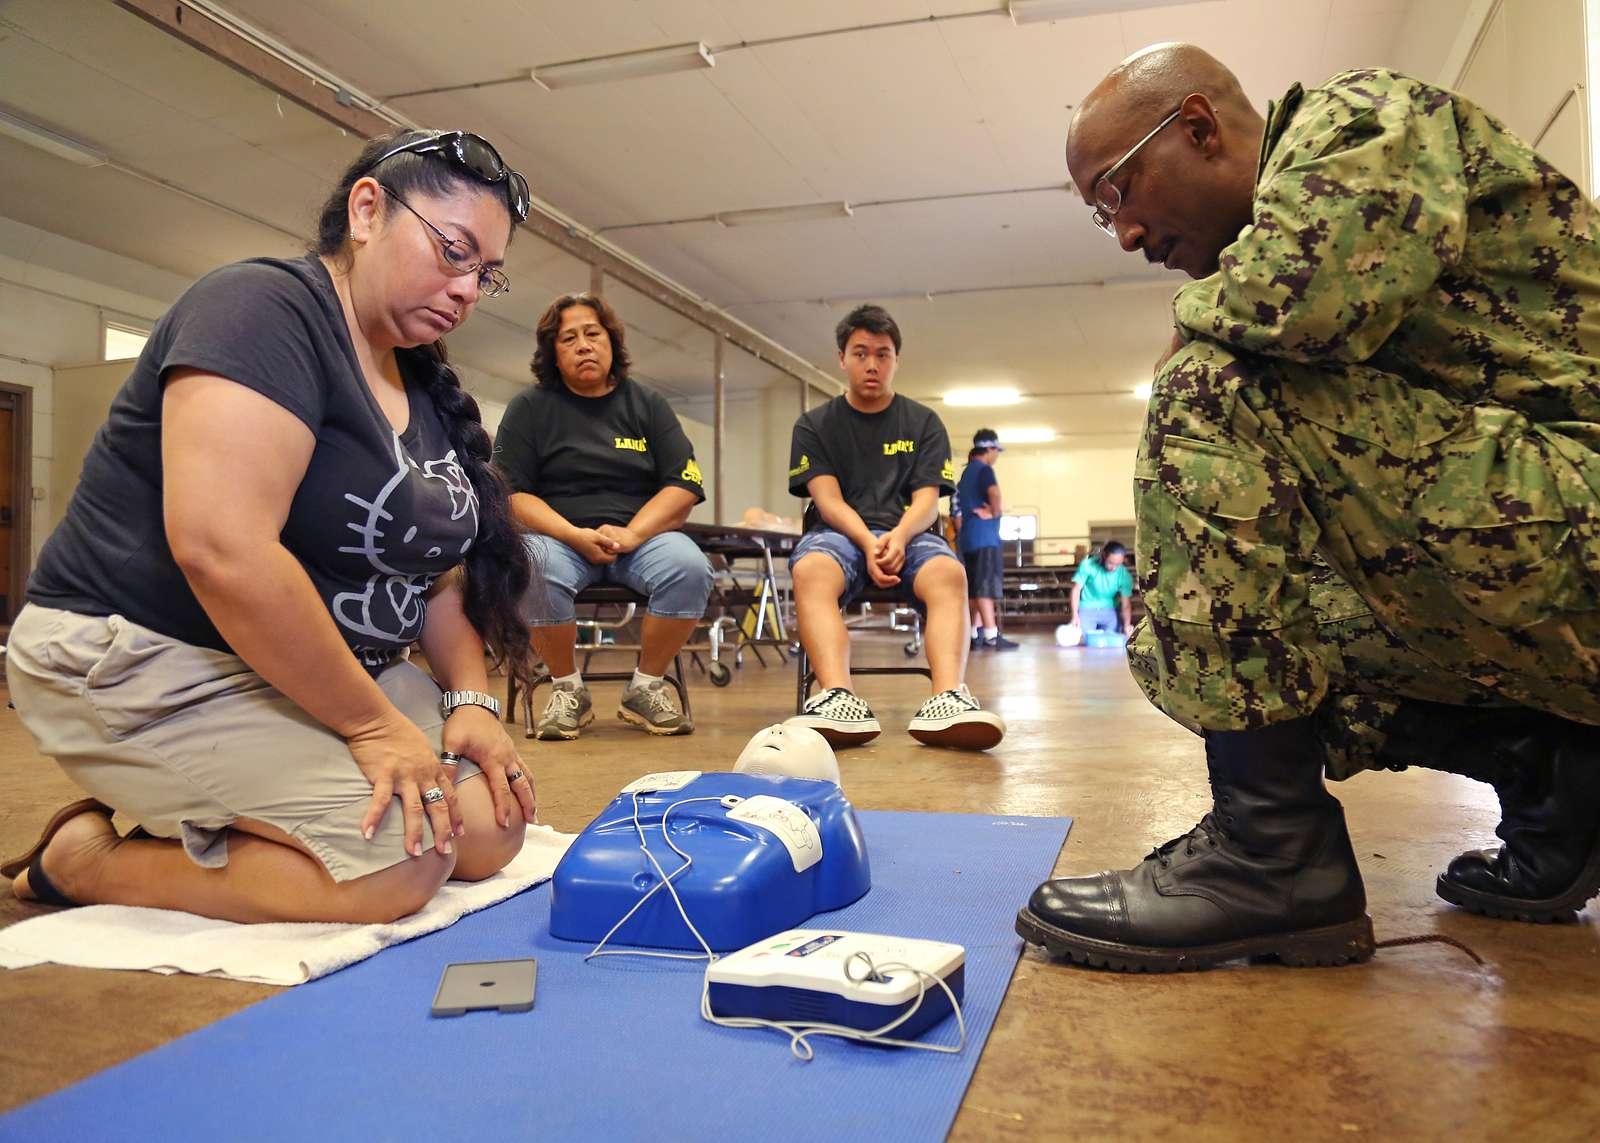 A Lanai community member and U.S. Navy Hospital Corpsman